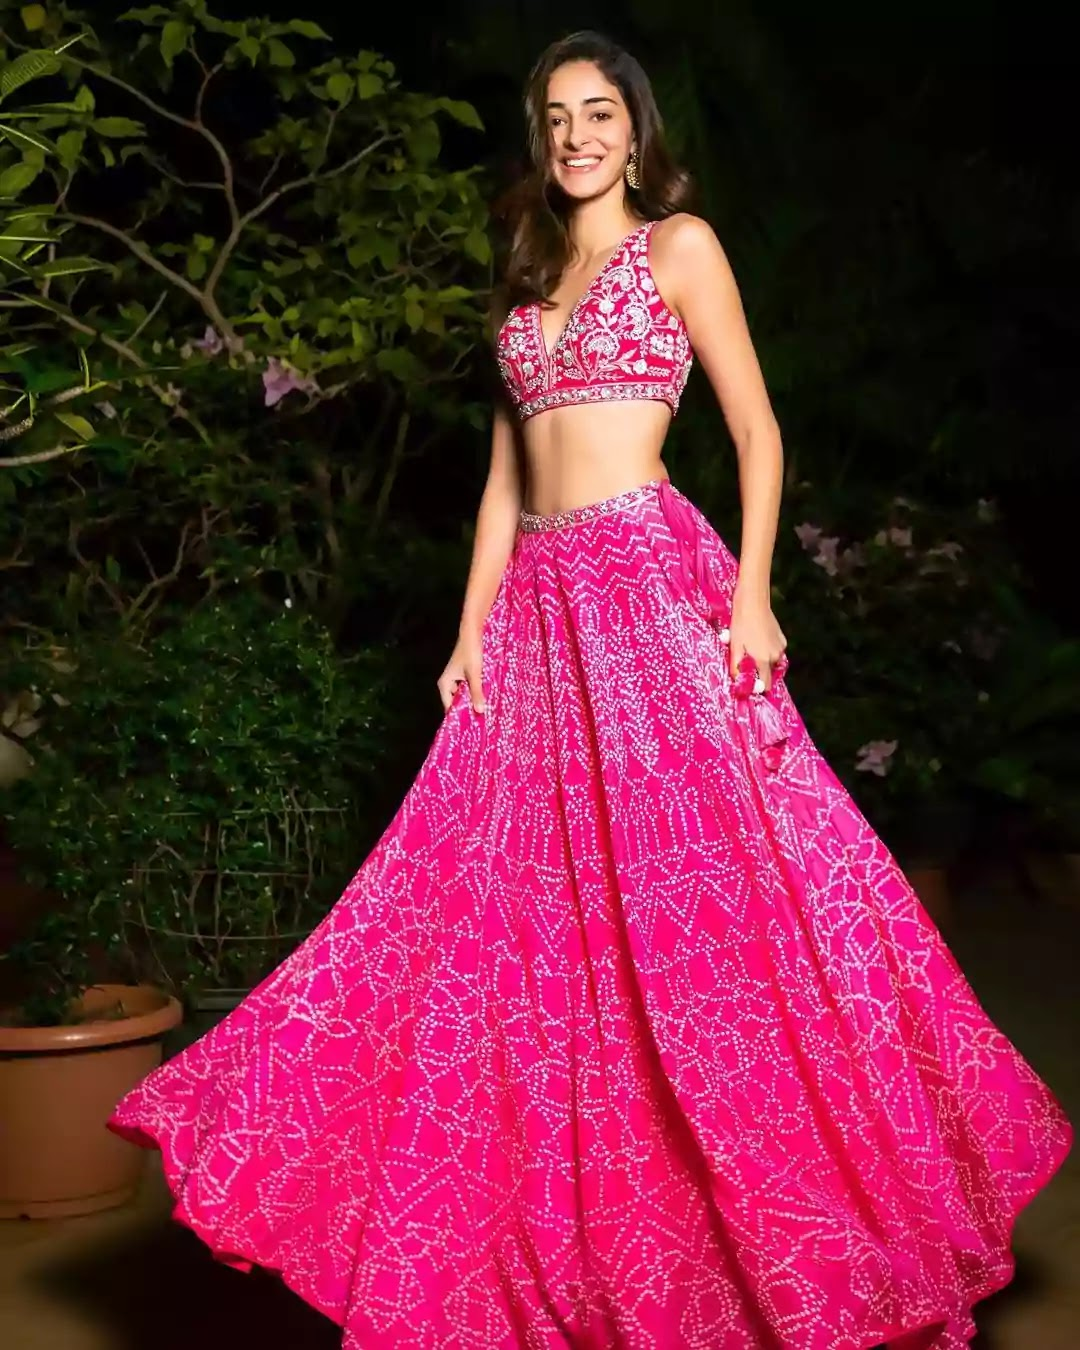 ananya-panday-in-pink-lehenga